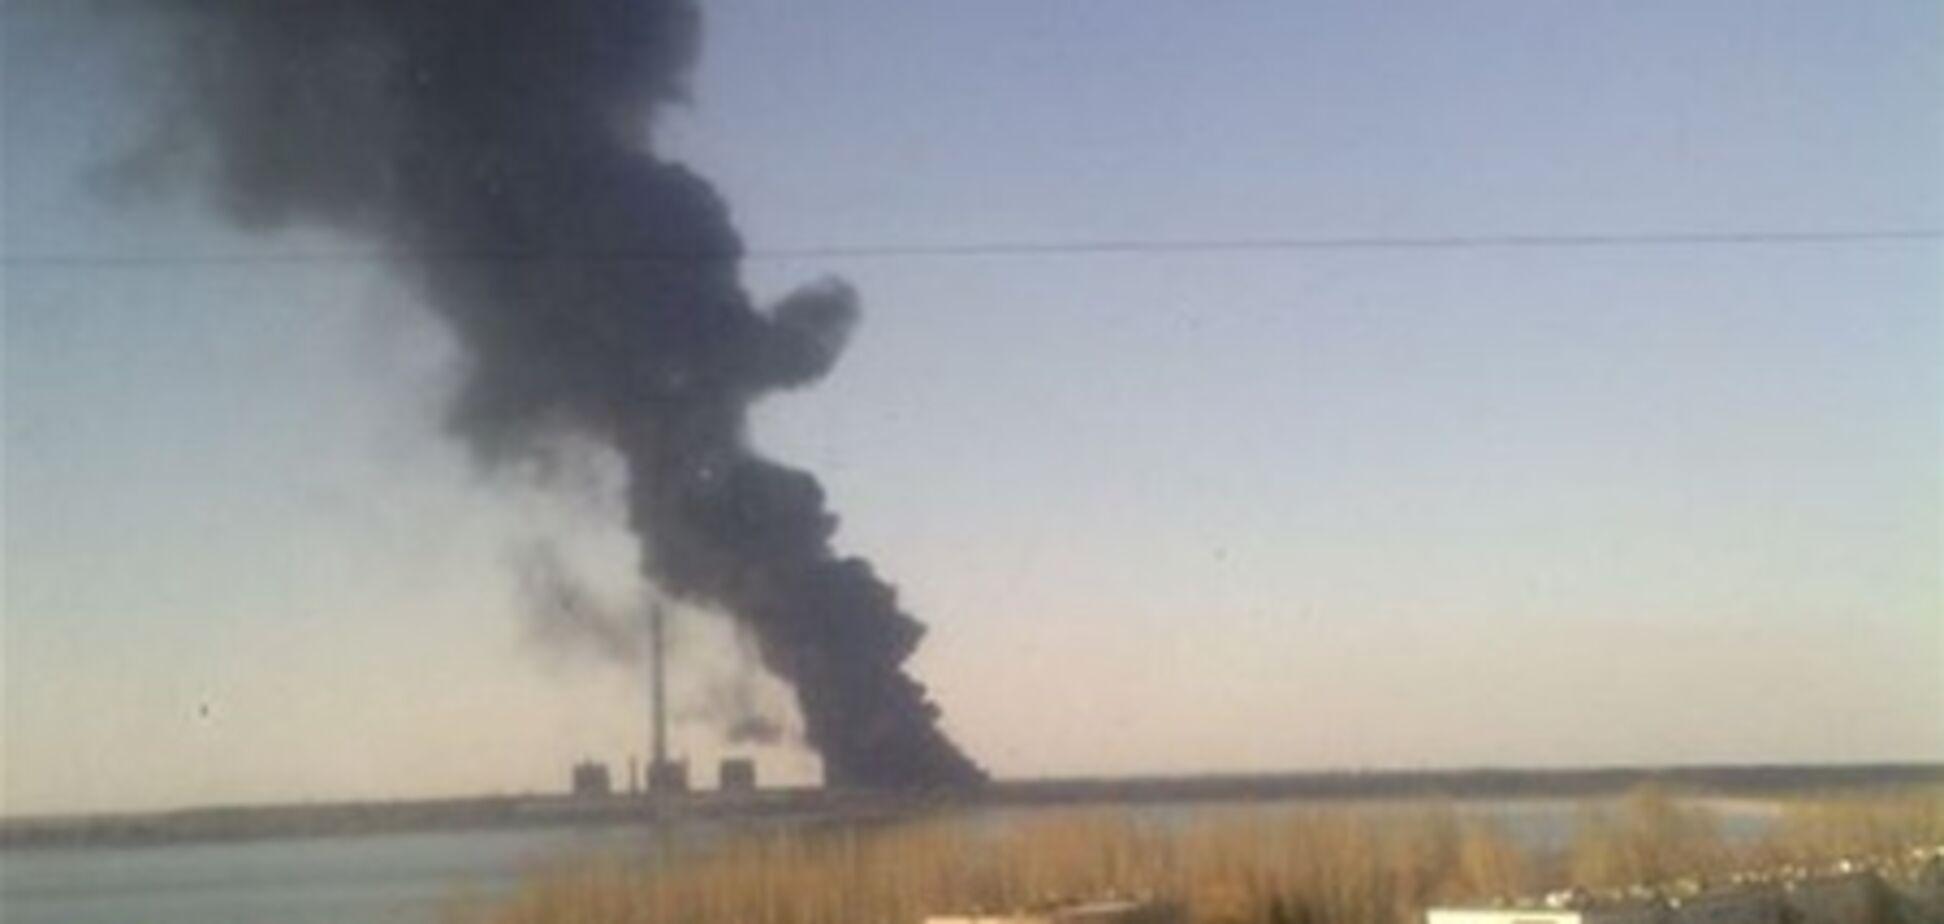 Пожар на Углегорской ТЭС уничтожил 4 энергоблока